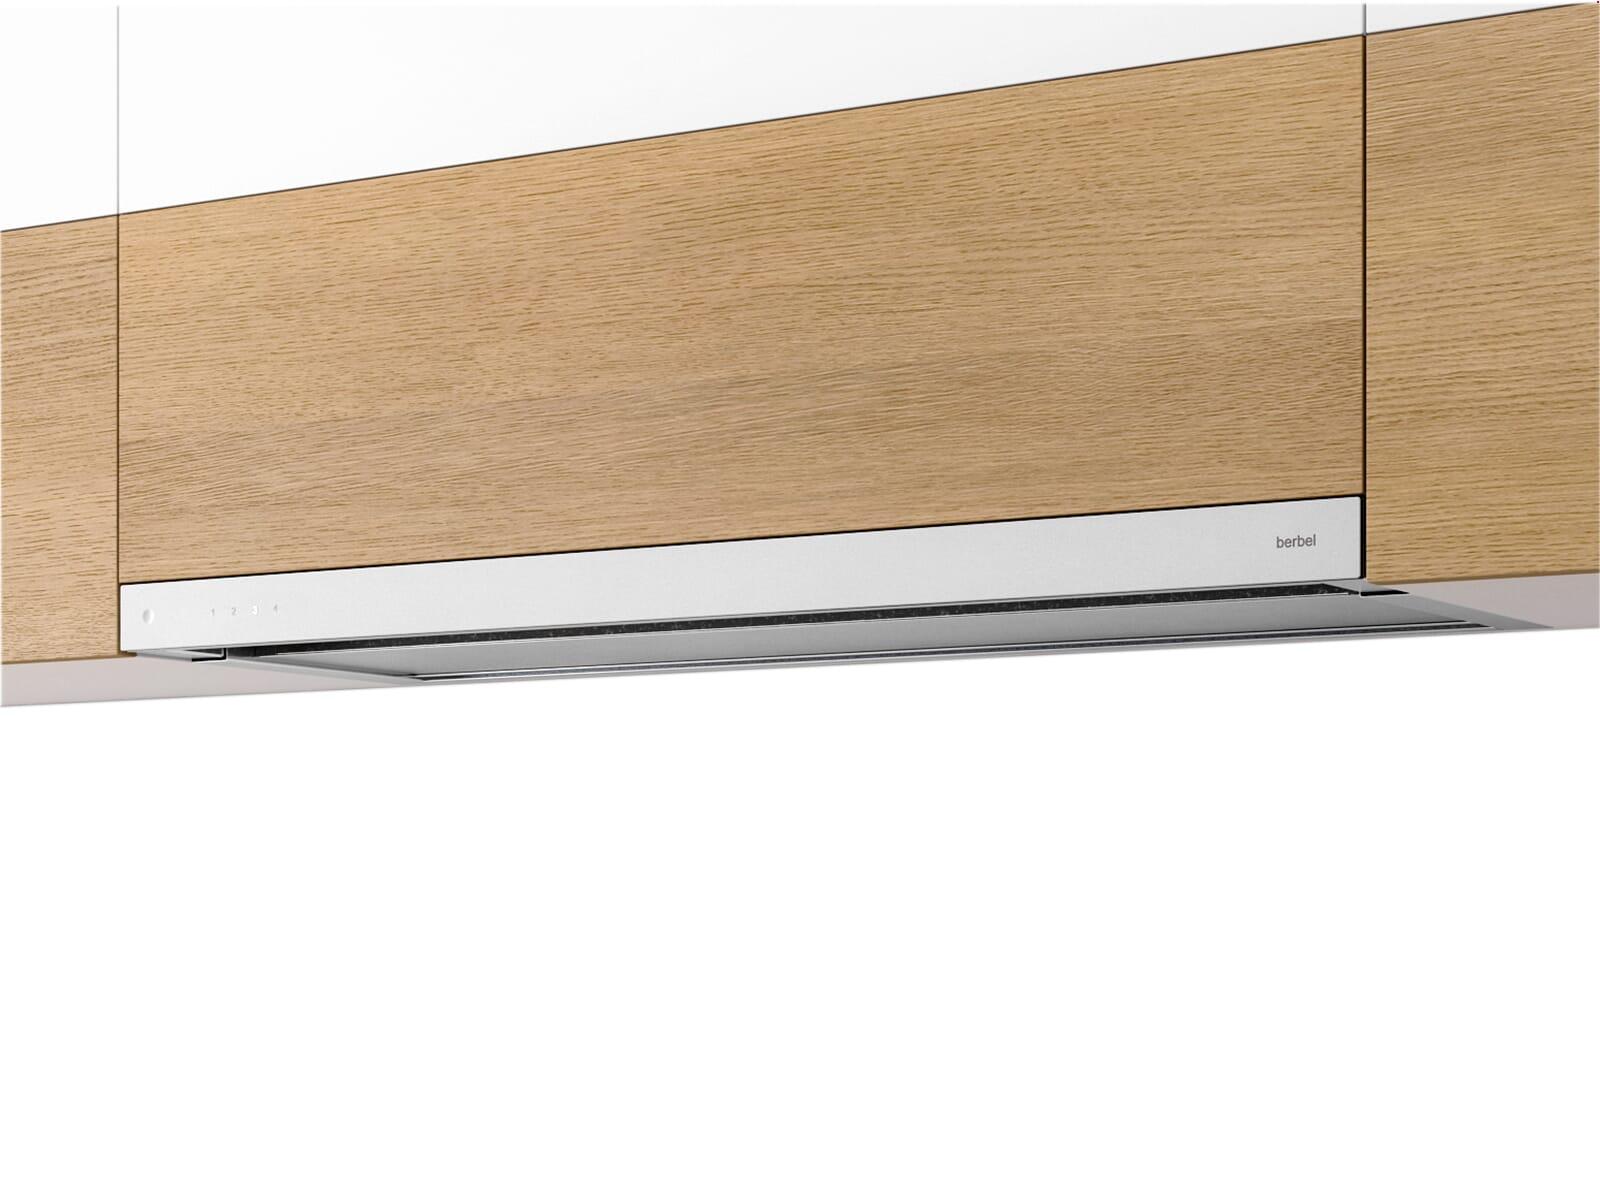 berbel glassline beh 90 gl flachschirmhaube wei. Black Bedroom Furniture Sets. Home Design Ideas